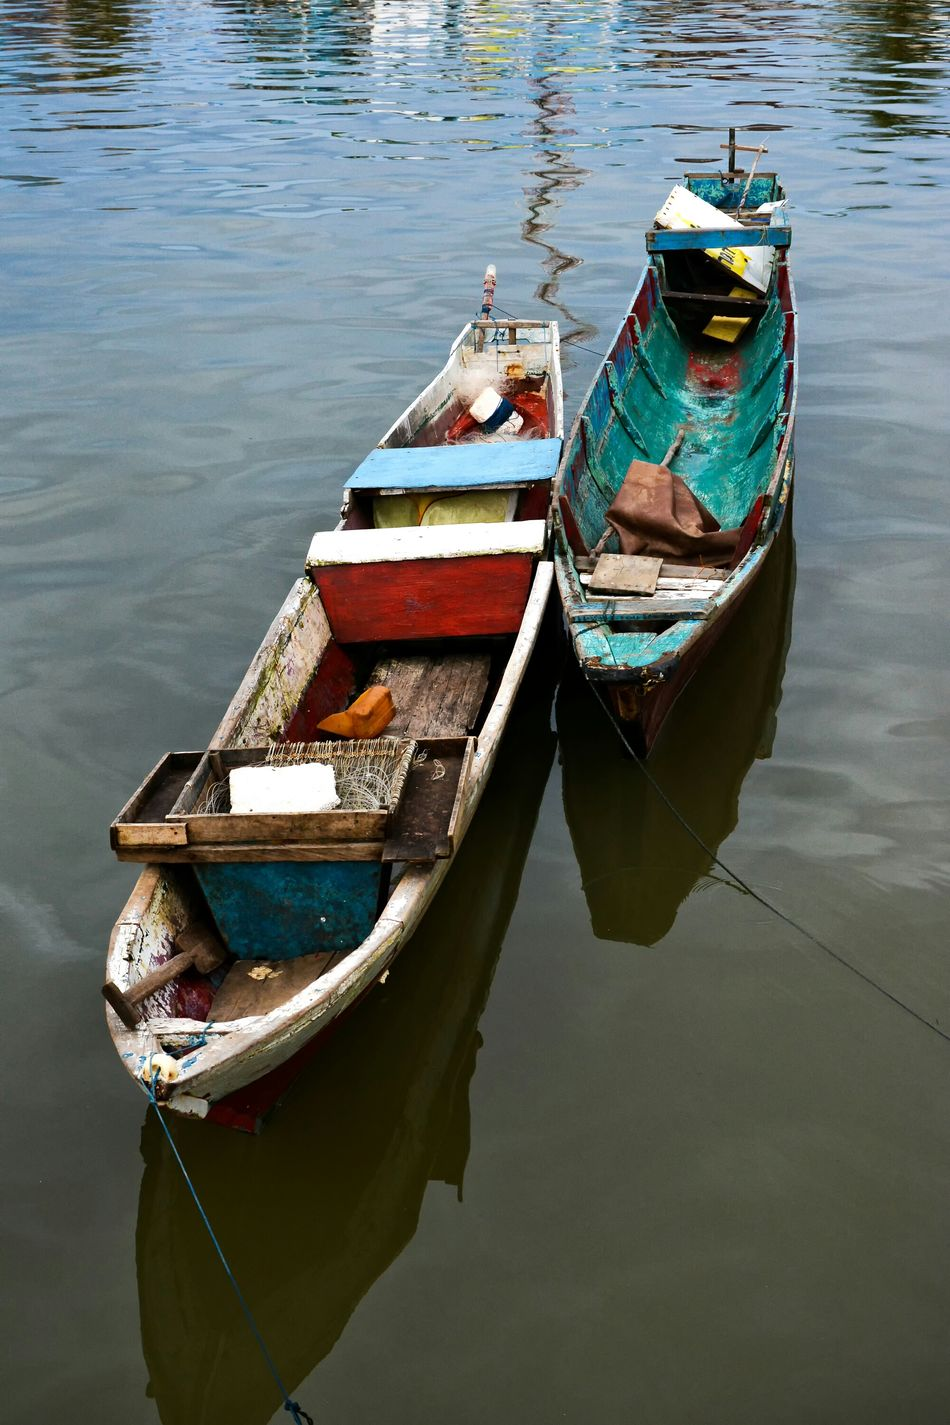 Nature Eye4photography  Fishing Boat Water Reflections Tadaa Community EyeEm Gallery EyeEm Best Shots Kendari Bay